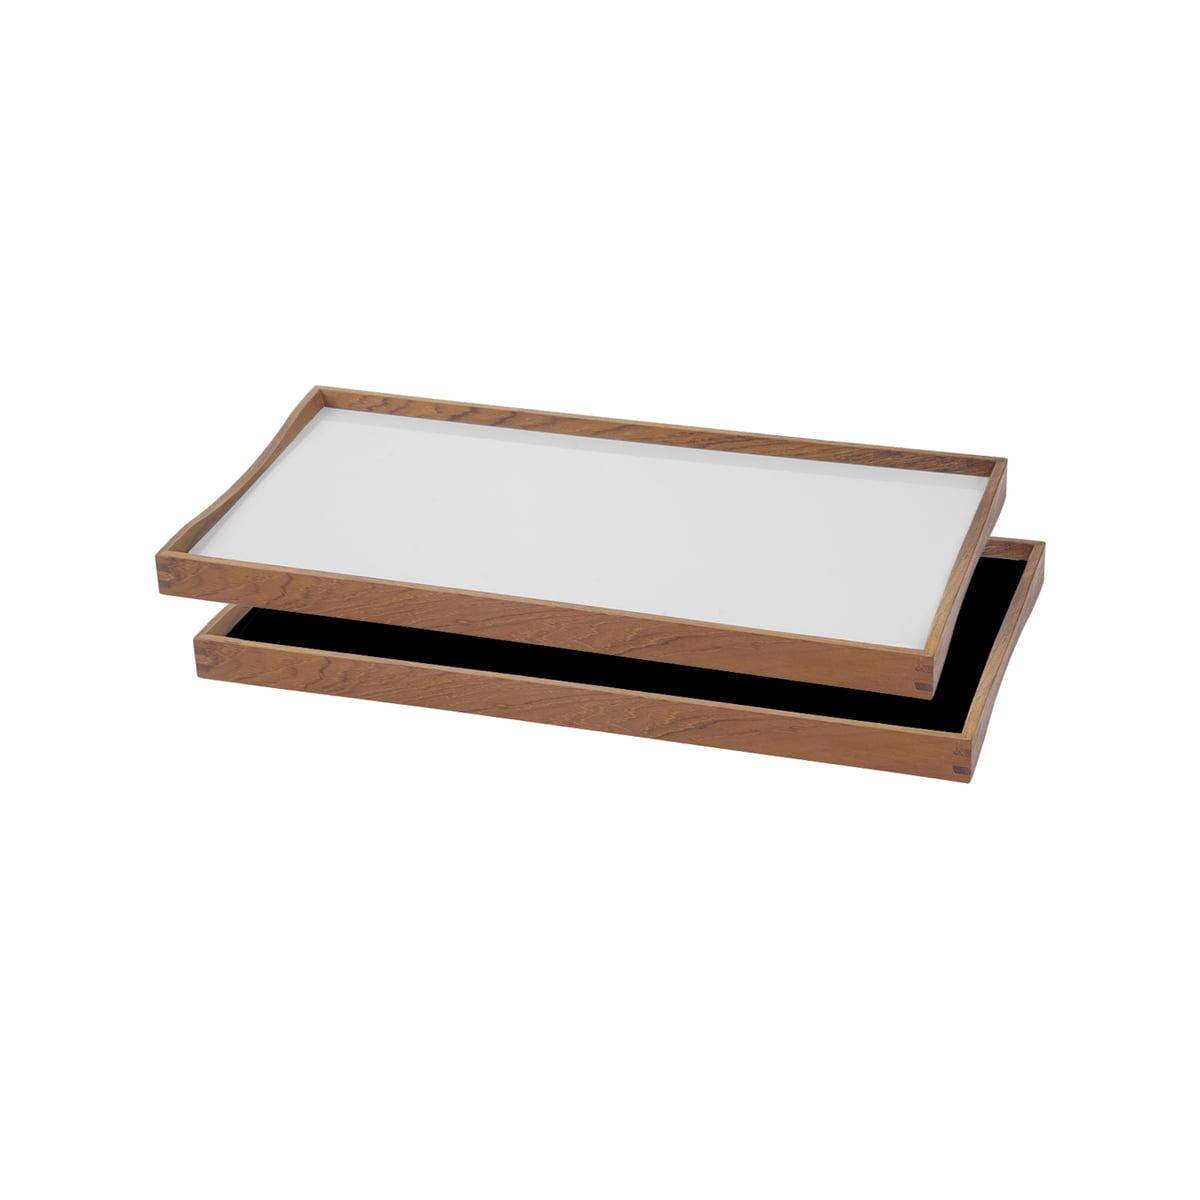 ArchitectMade   Tablett Turning Tray, 23 X 45, White